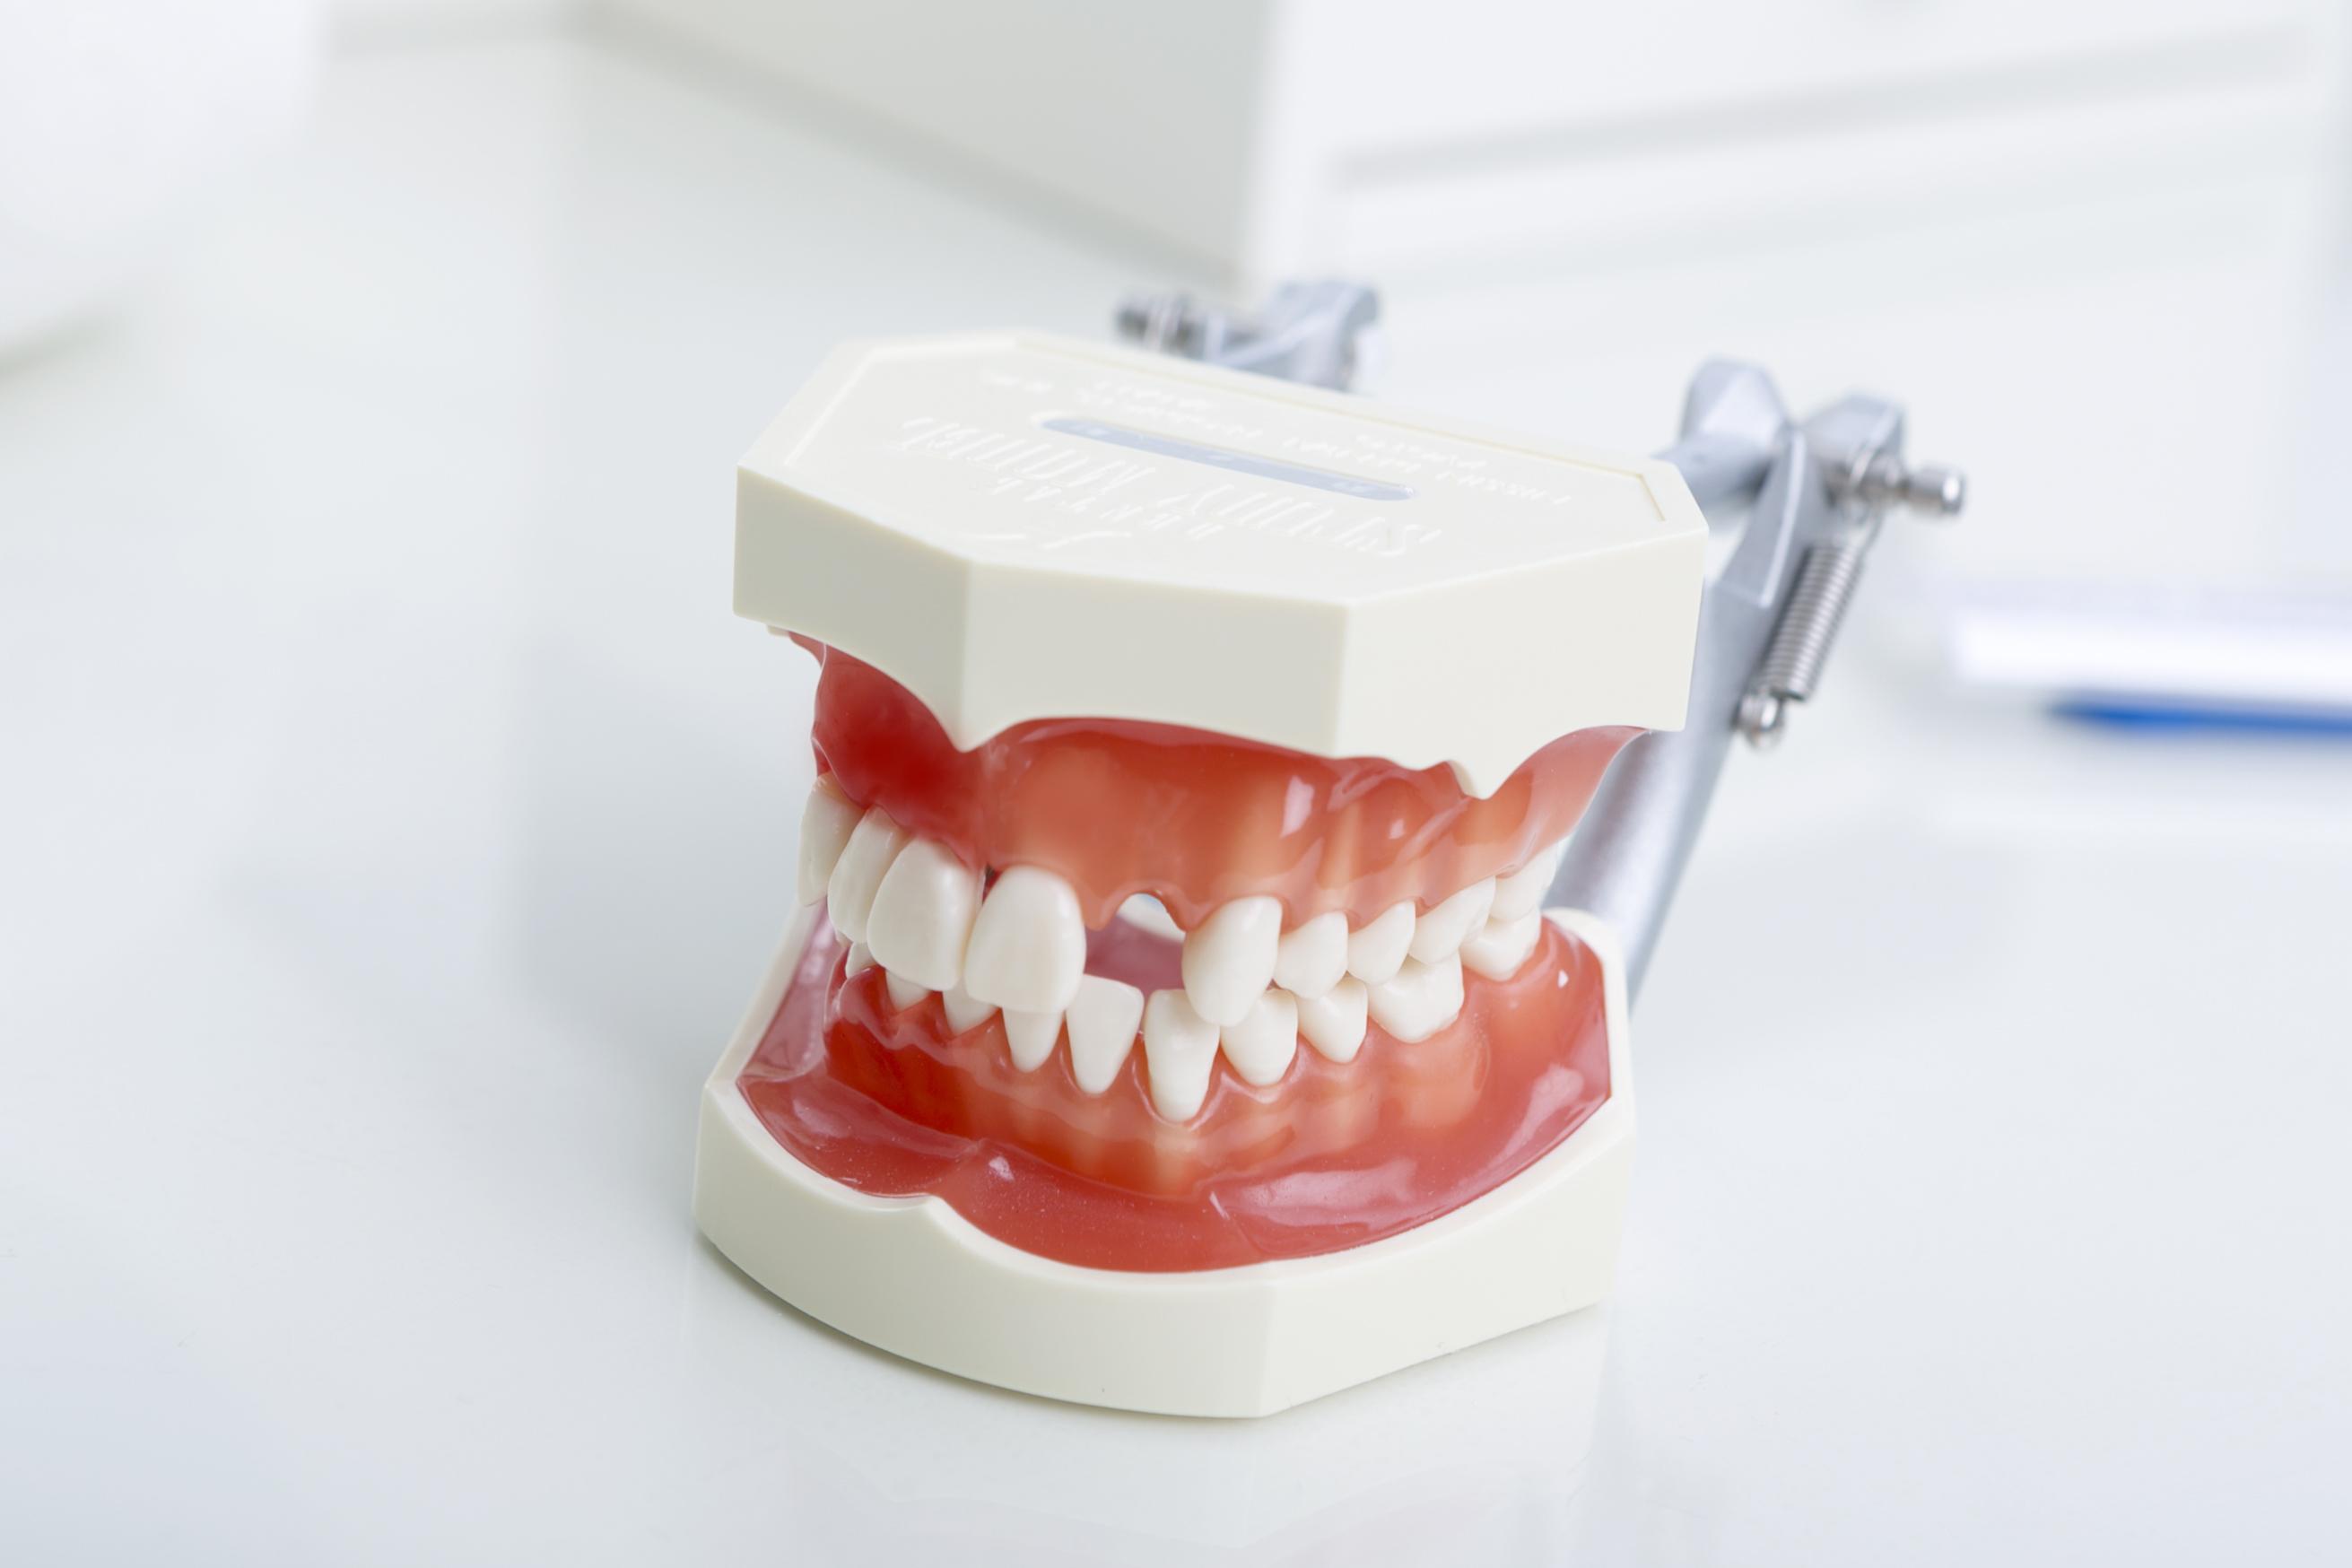 Implantologie Carree Dental MVZ Köln